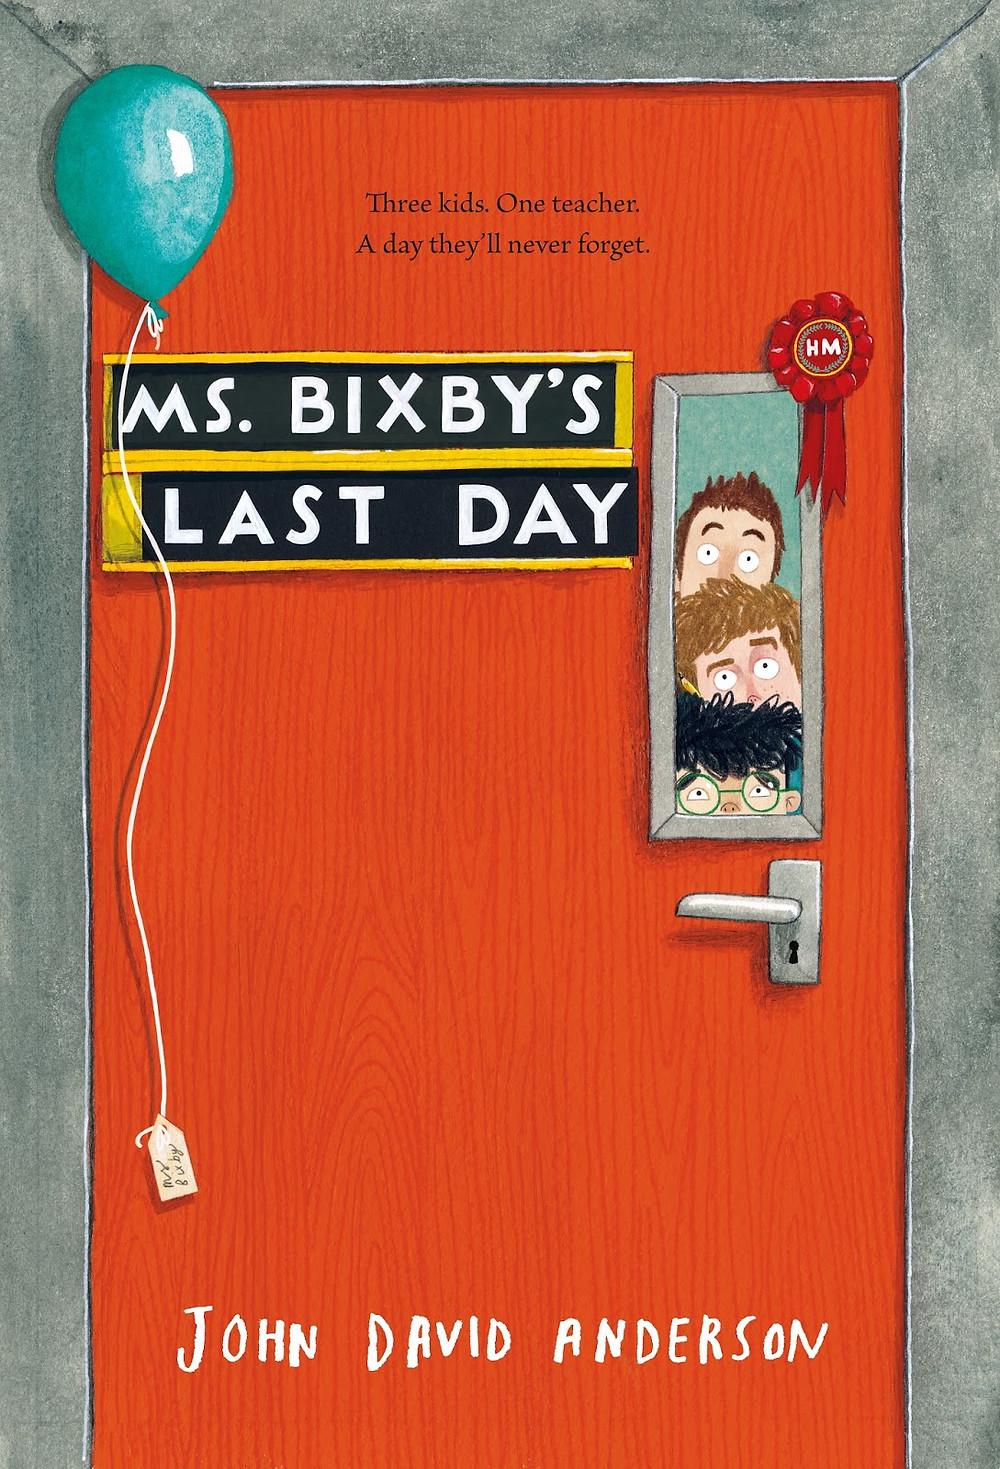 Ms. Bixby's Last Day by John David Anderson